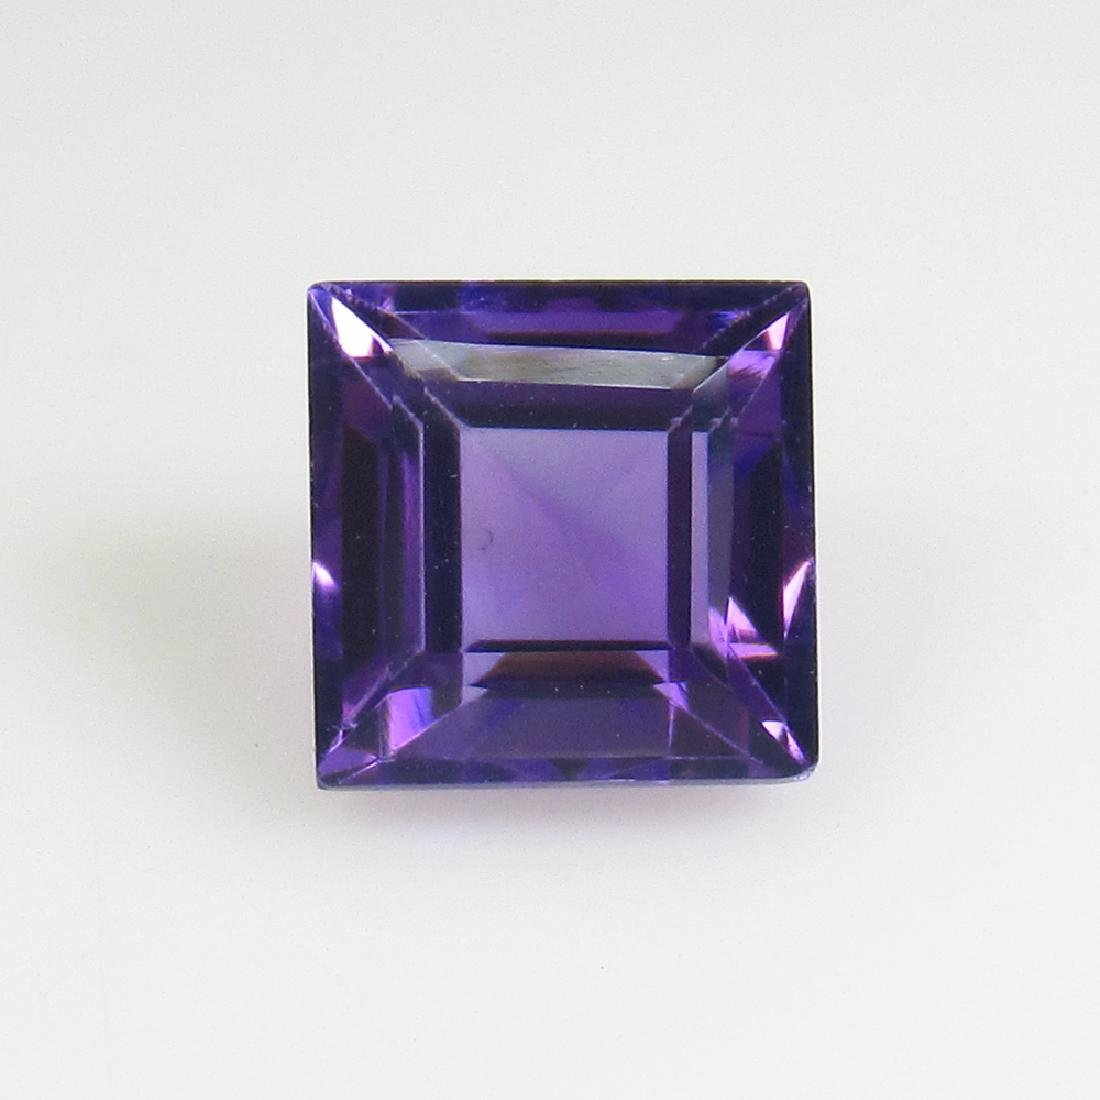 2.05 Ct Genuine Brazil Purple Amethyst Square Cut